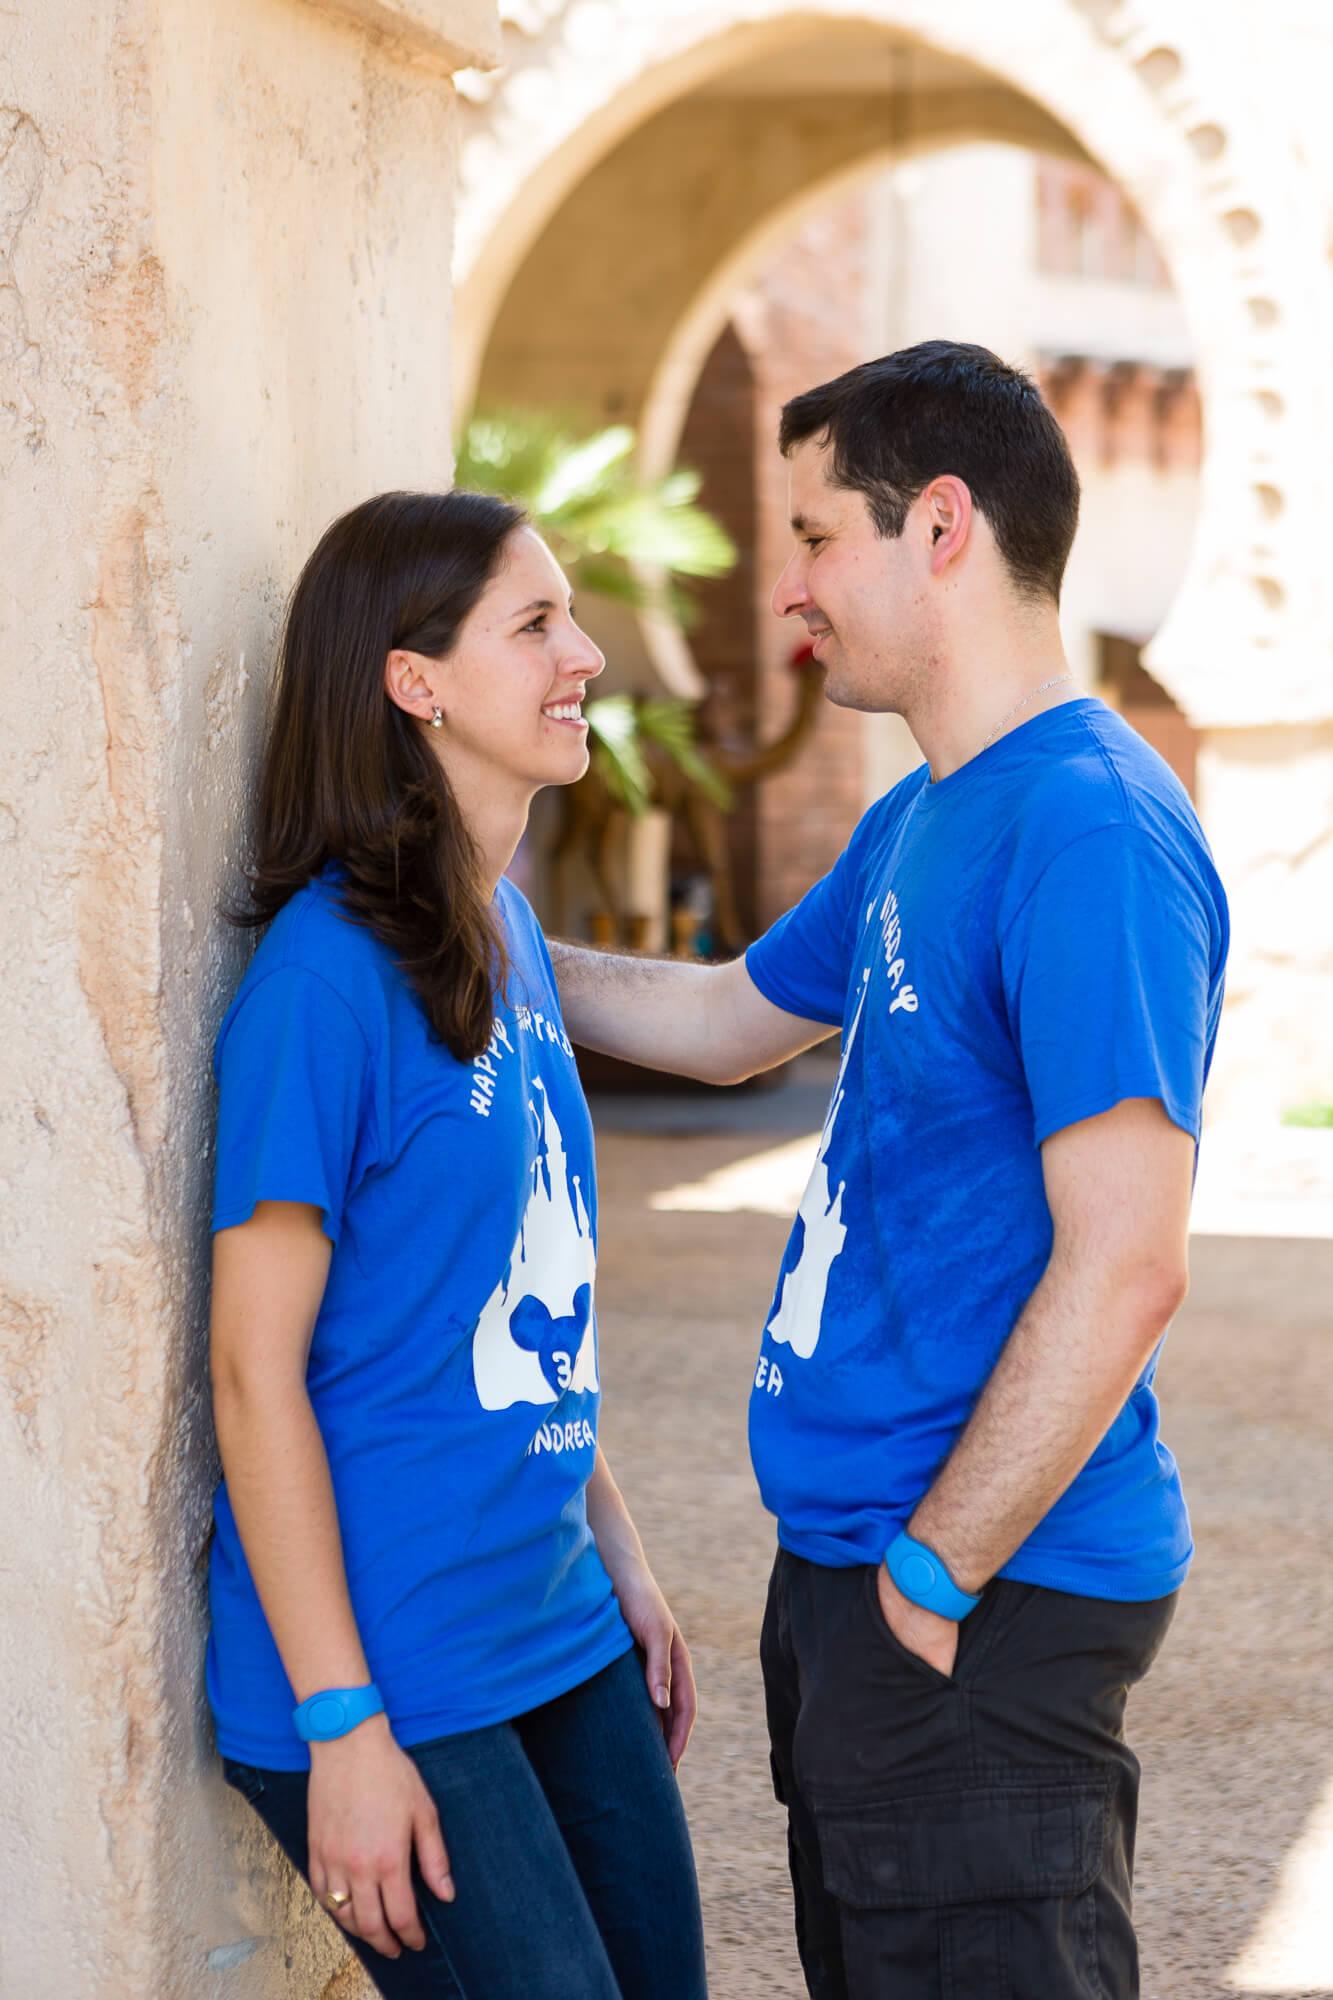 Jose and Andrea's proposal photos at epcot